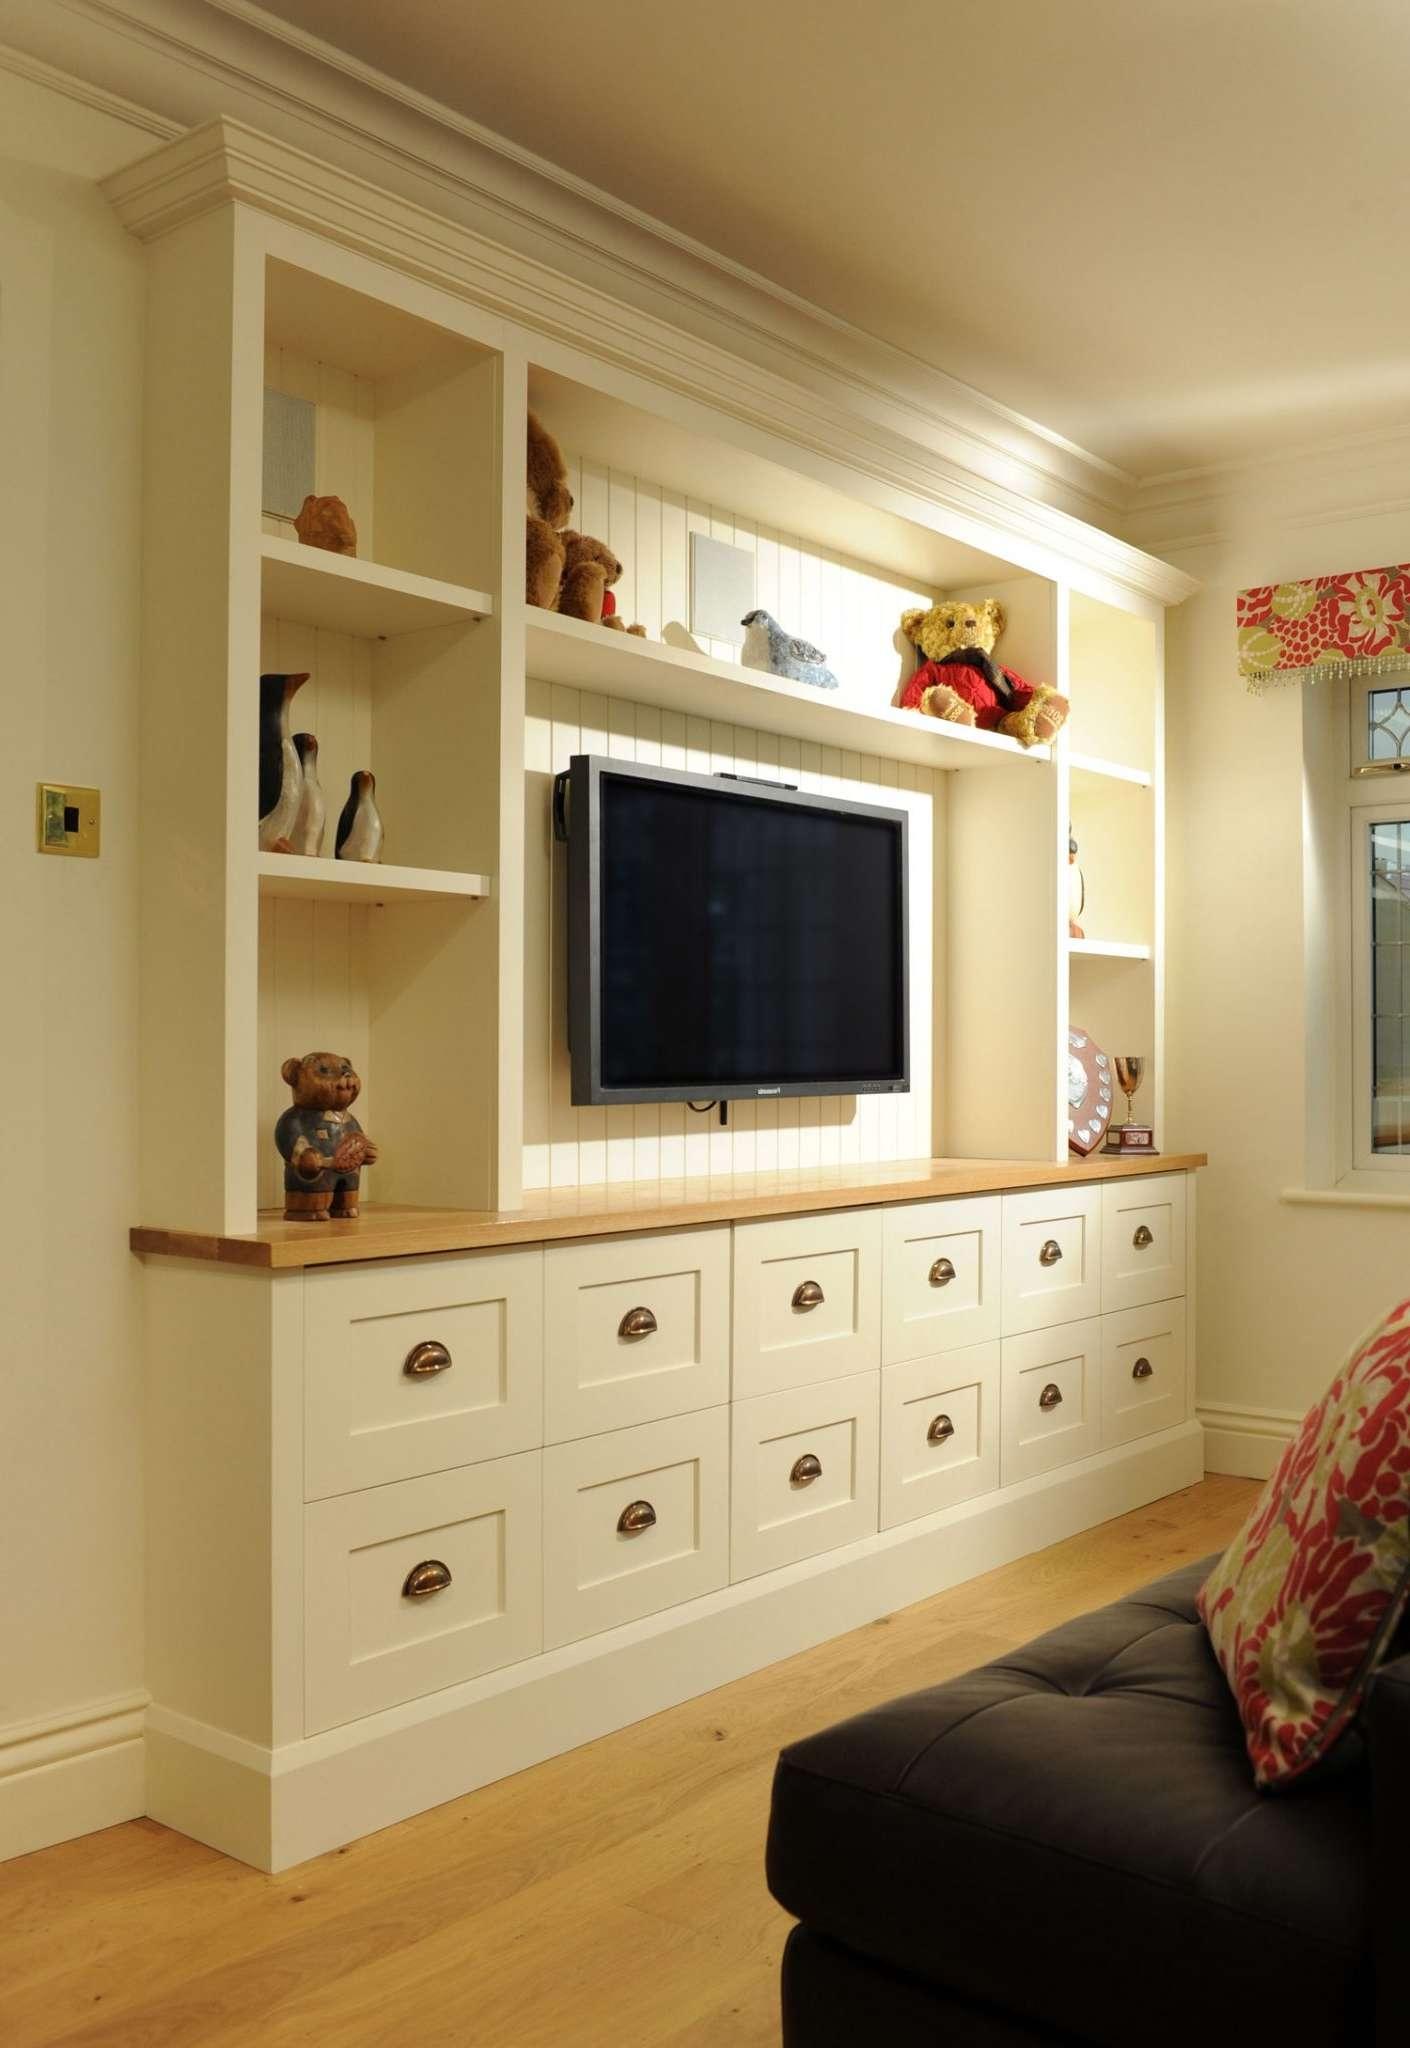 Bespoke Tv Units & Media Cabinets Custom Madehand – James Mayor Inside Bespoke Tv Cabinets (View 6 of 20)